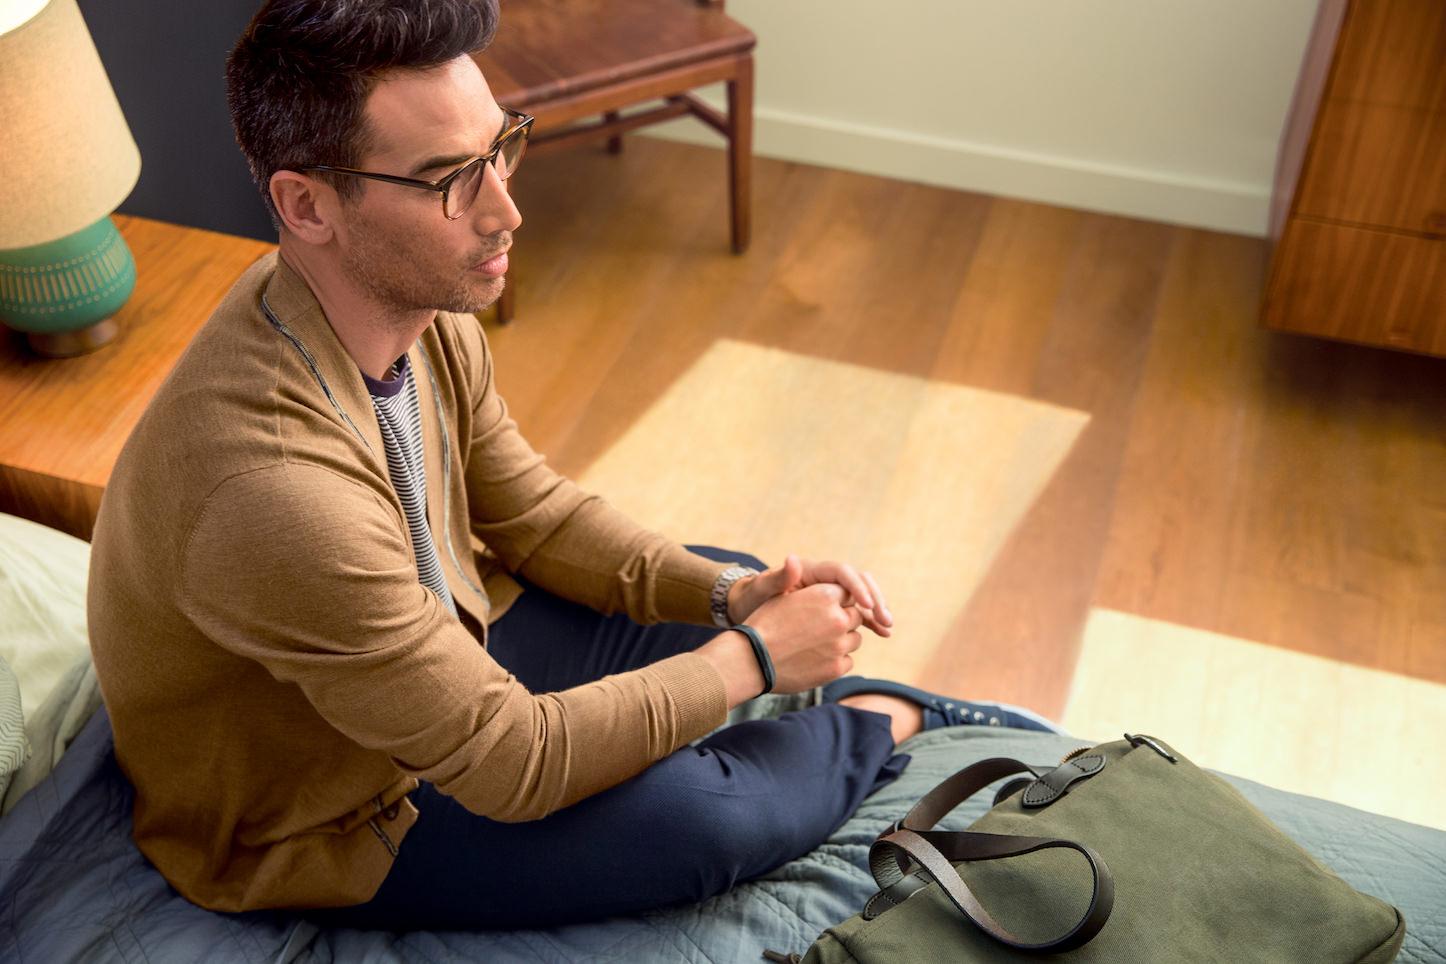 Fitbit Flex 2 Man Getting Ready Lifestyle